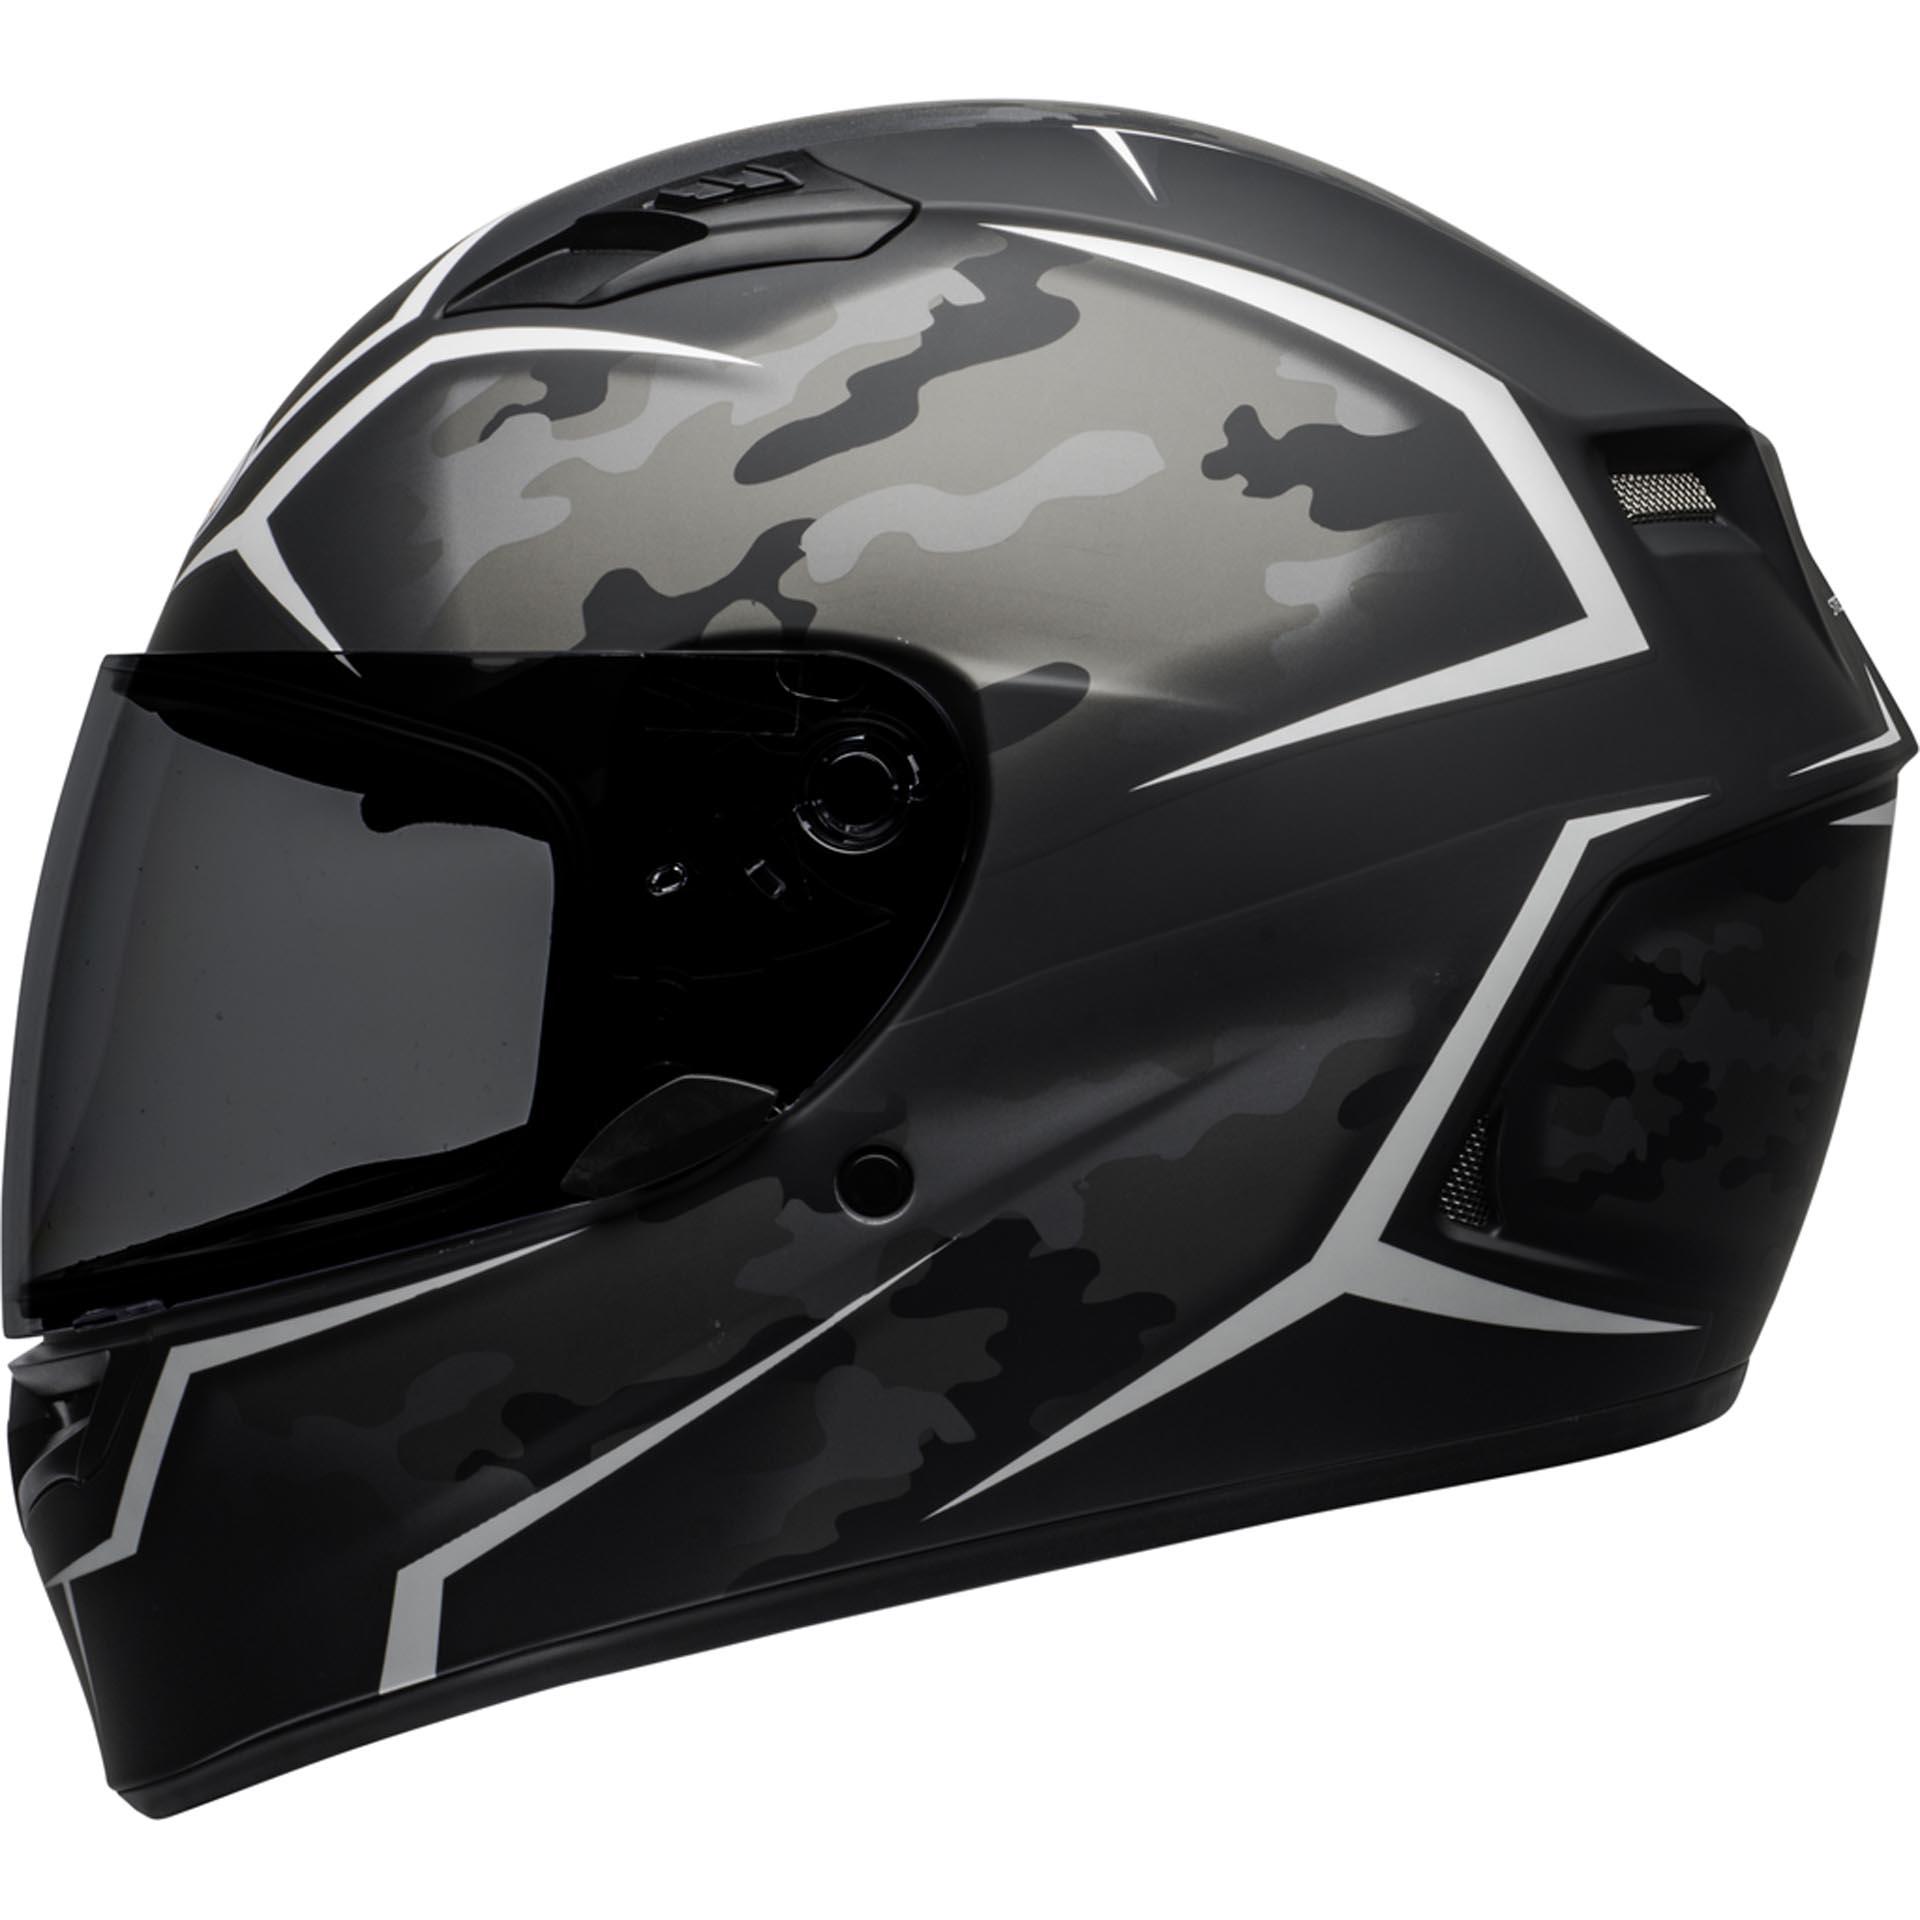 Bell Motorcycle Helmet >> Bell Qualifier Motorcycle Full Face Helmet Stealth Camo Matte Black White